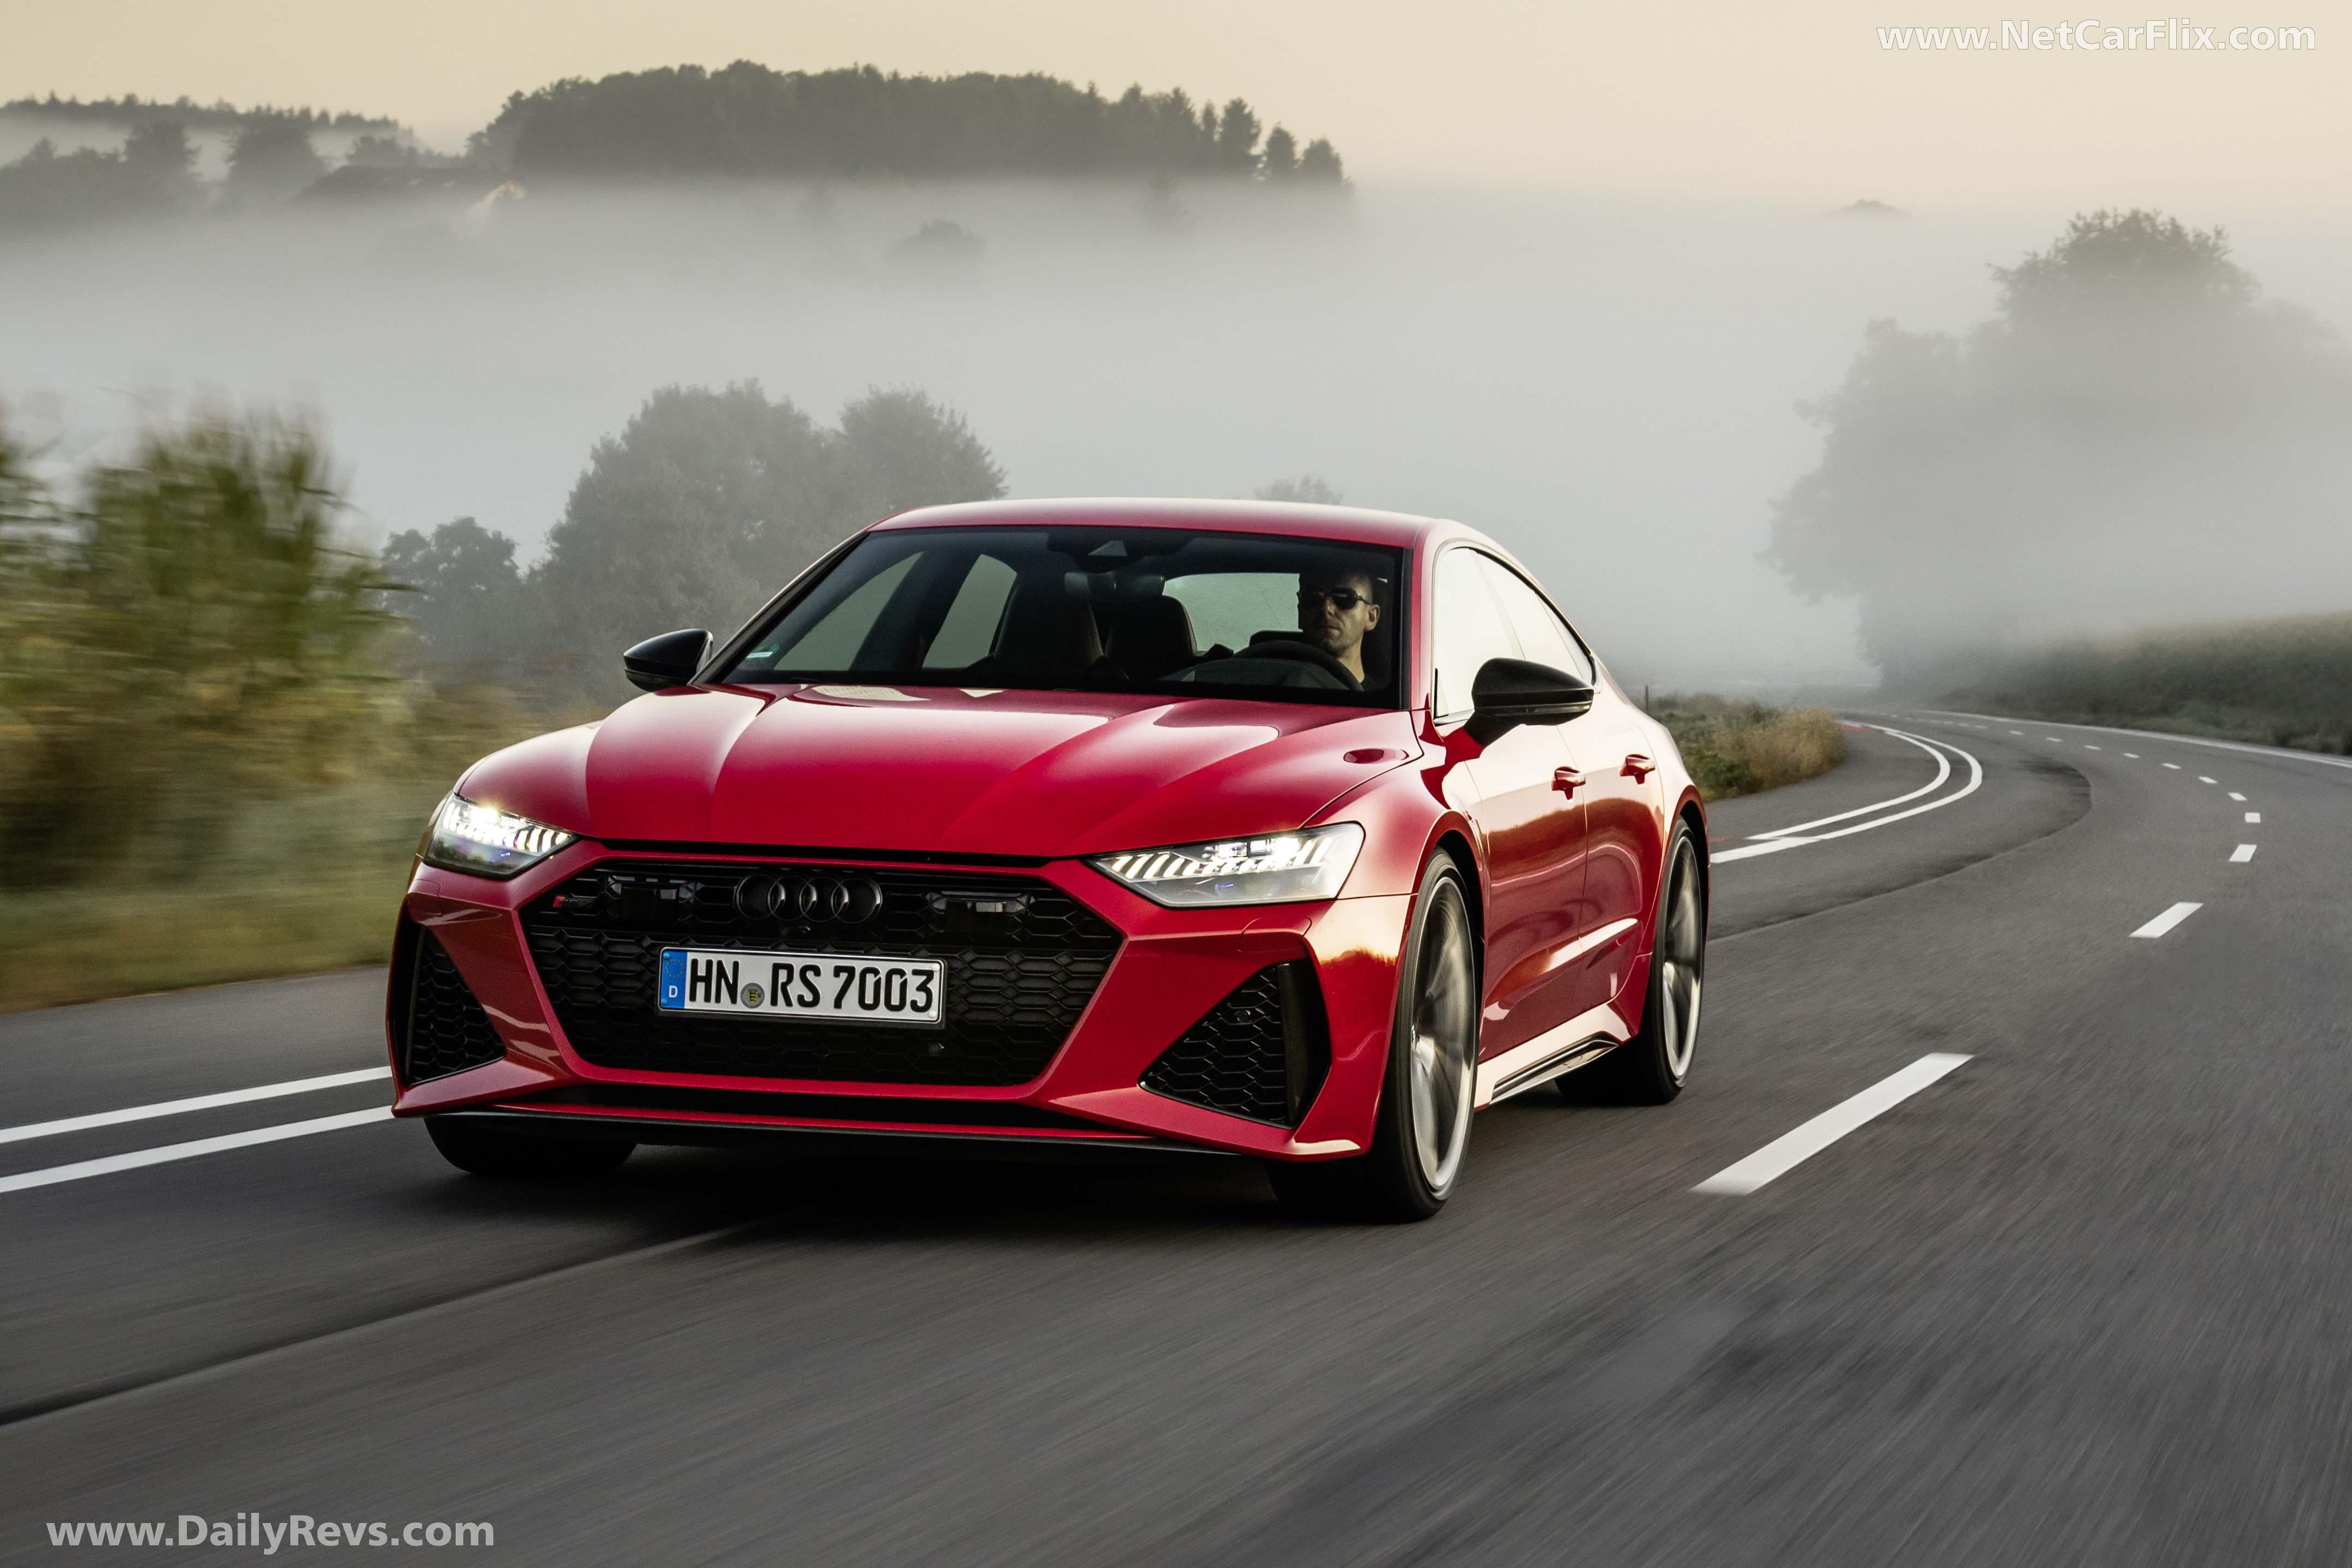 2020 Audi RS7 Sportback - Pictures, Images, Photos ...